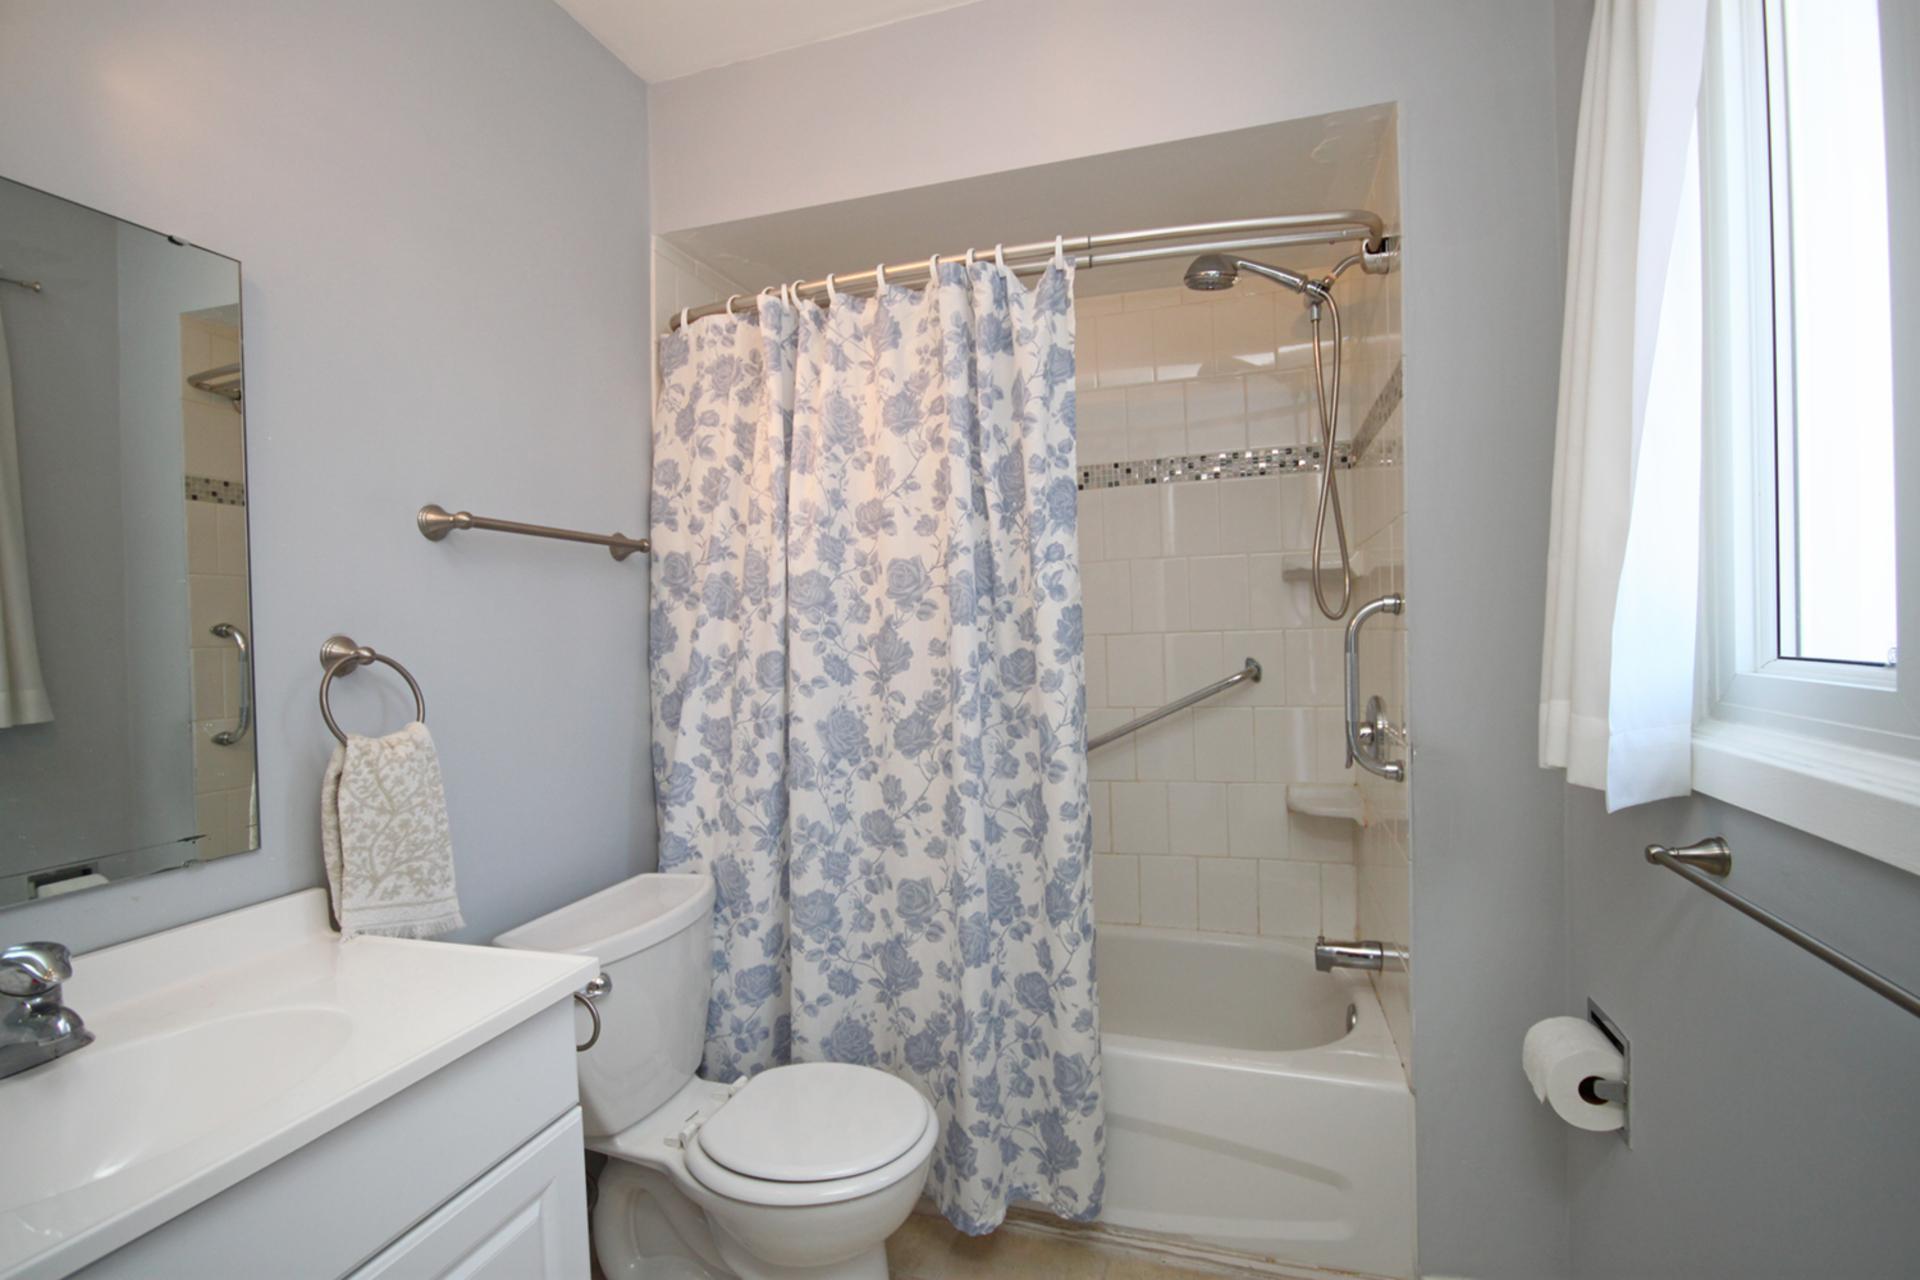 4 Piece Ensuite Bathroom at 17 Redwillow Drive, Parkwoods-Donalda, Toronto